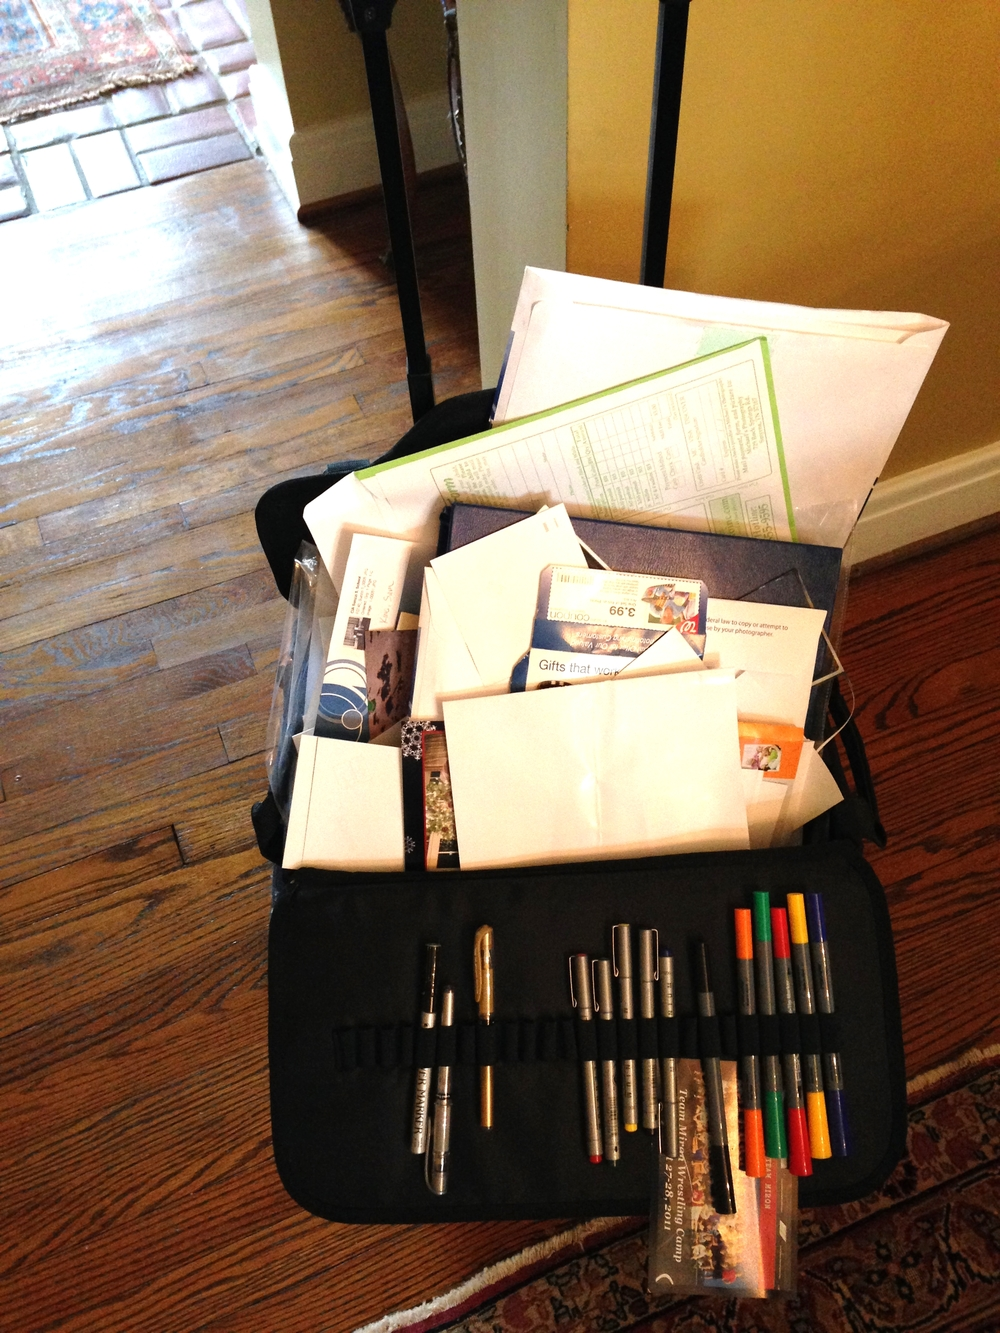 Unfinished scrapbooks